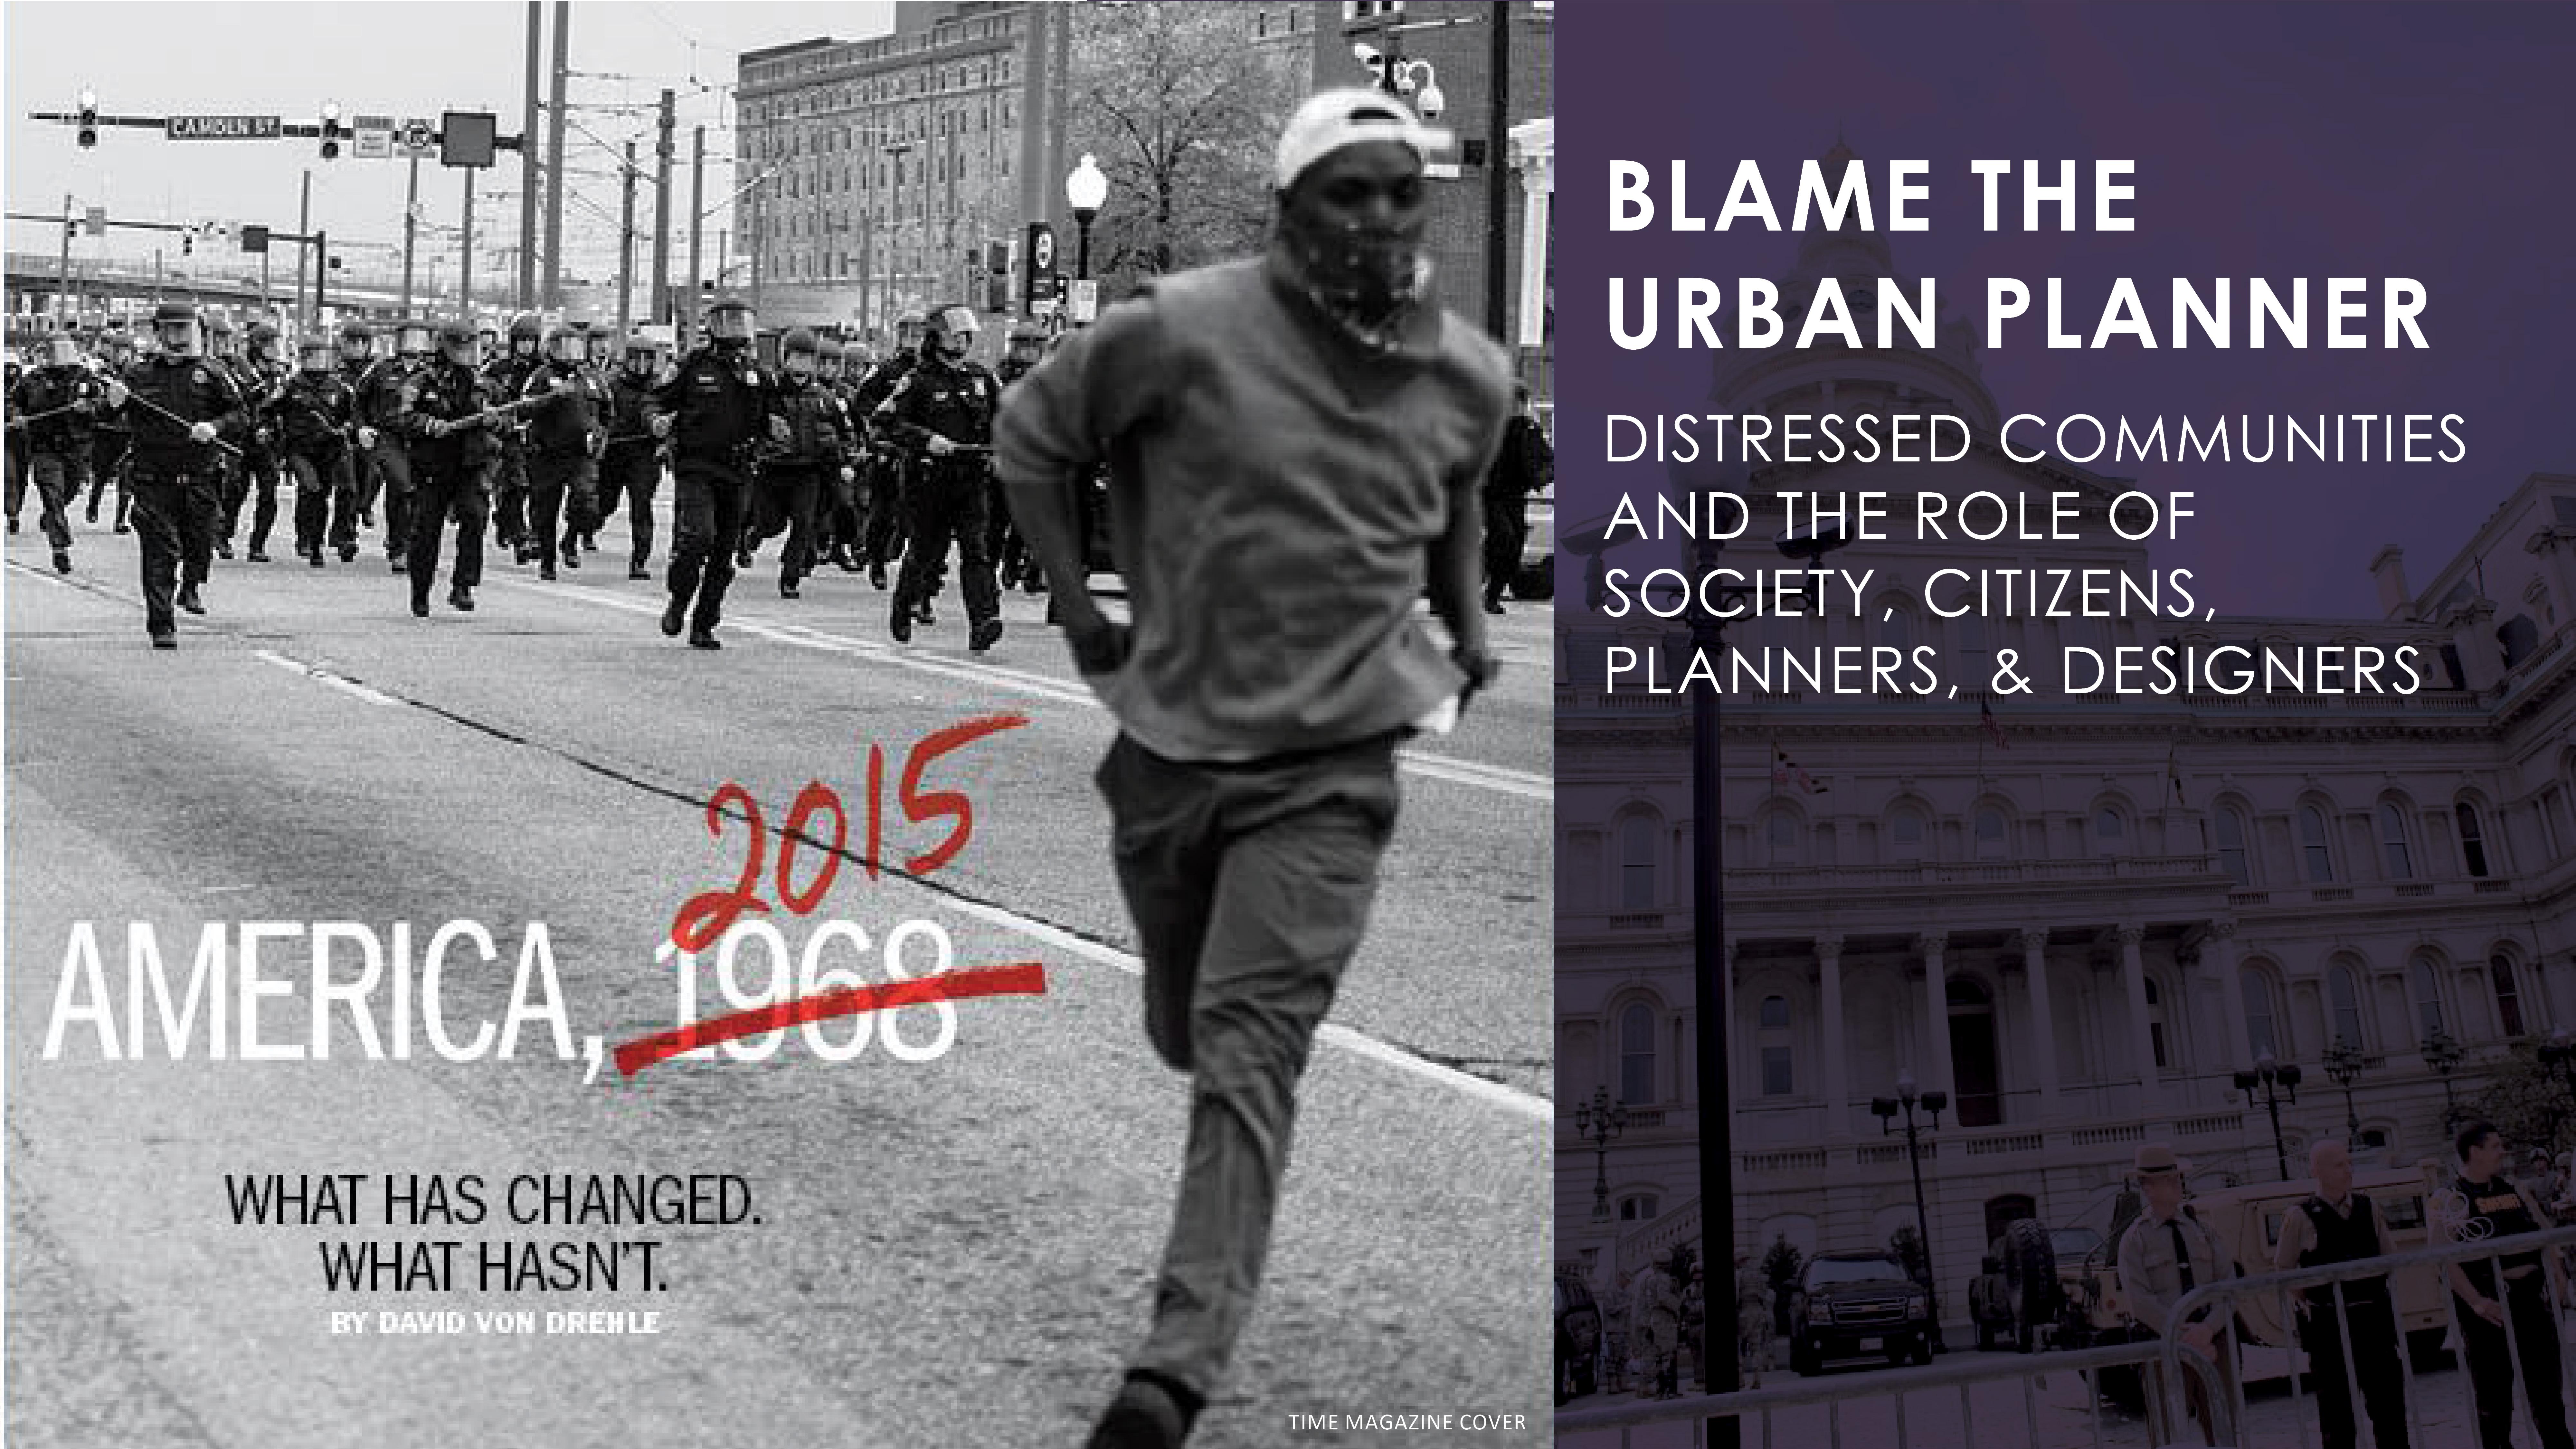 baltimore riots  u2026 blame the urban planner